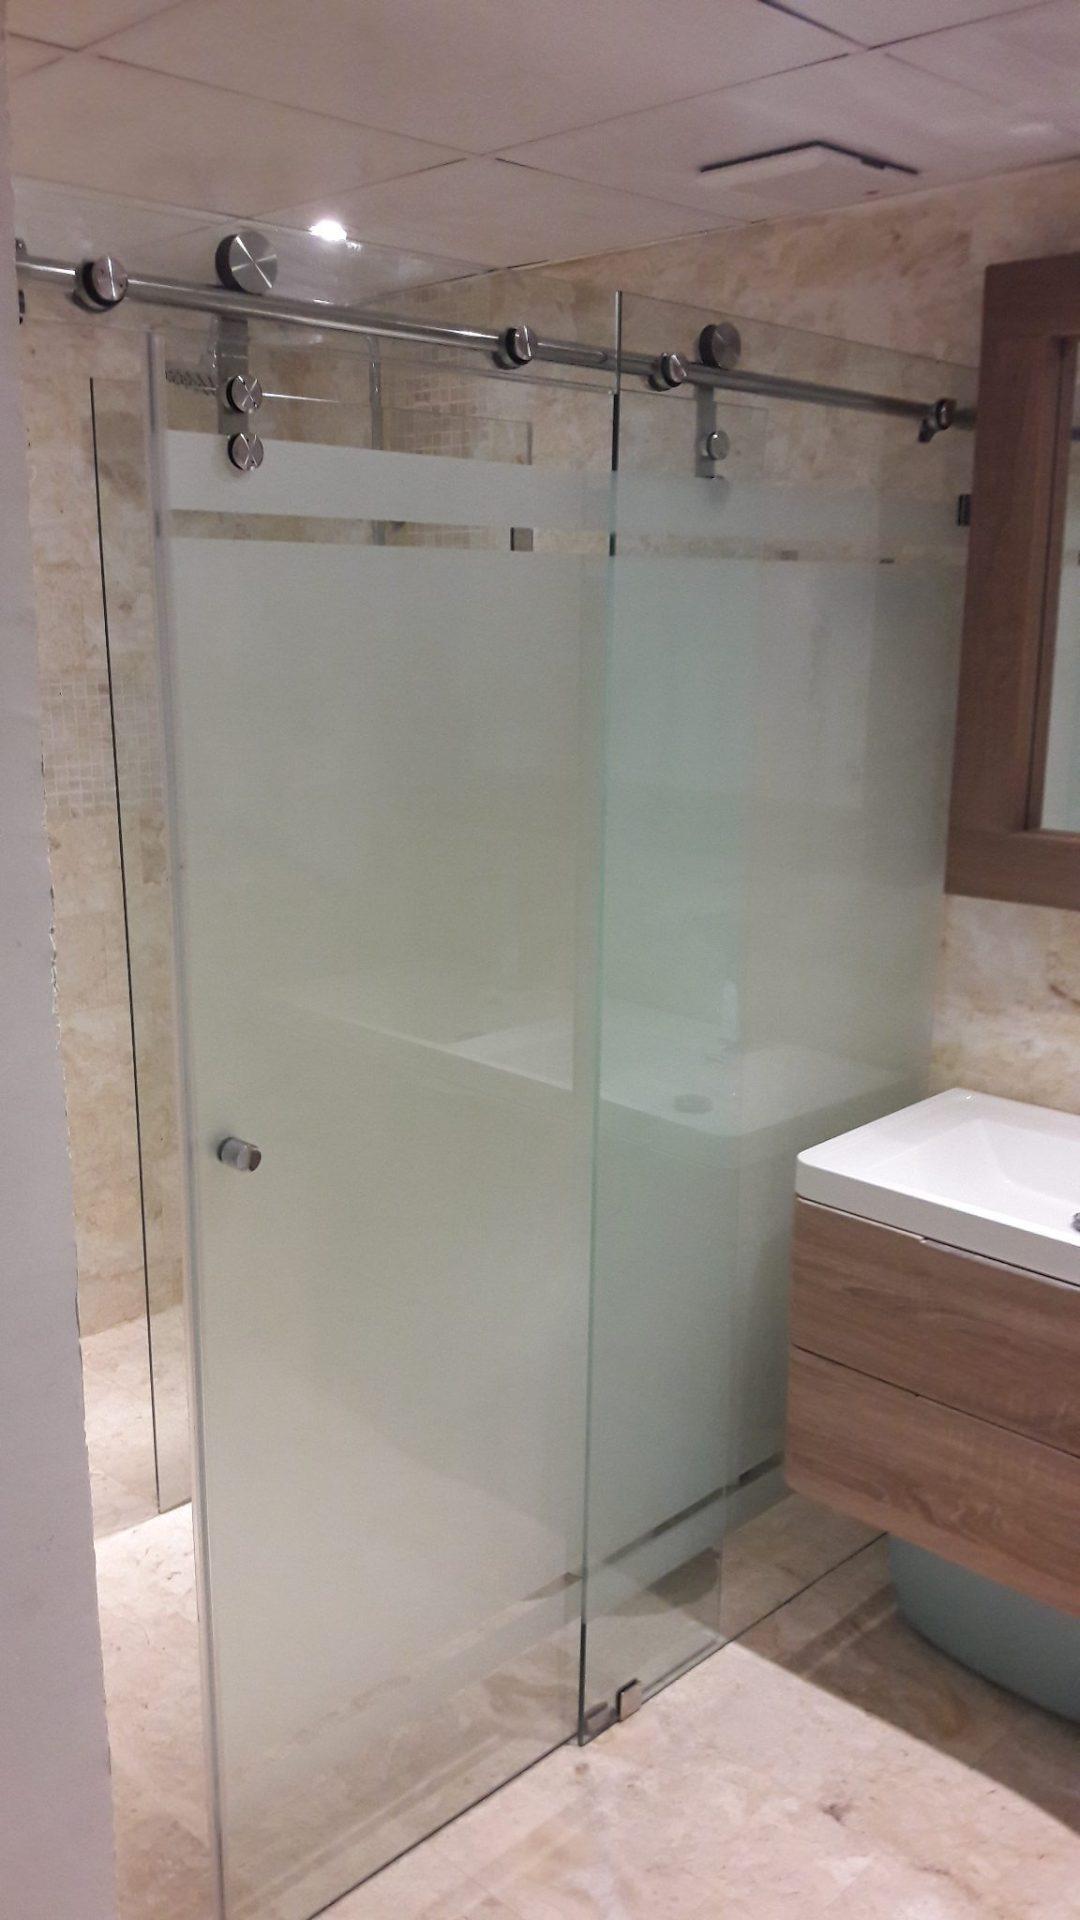 Mampara de baño deslizante